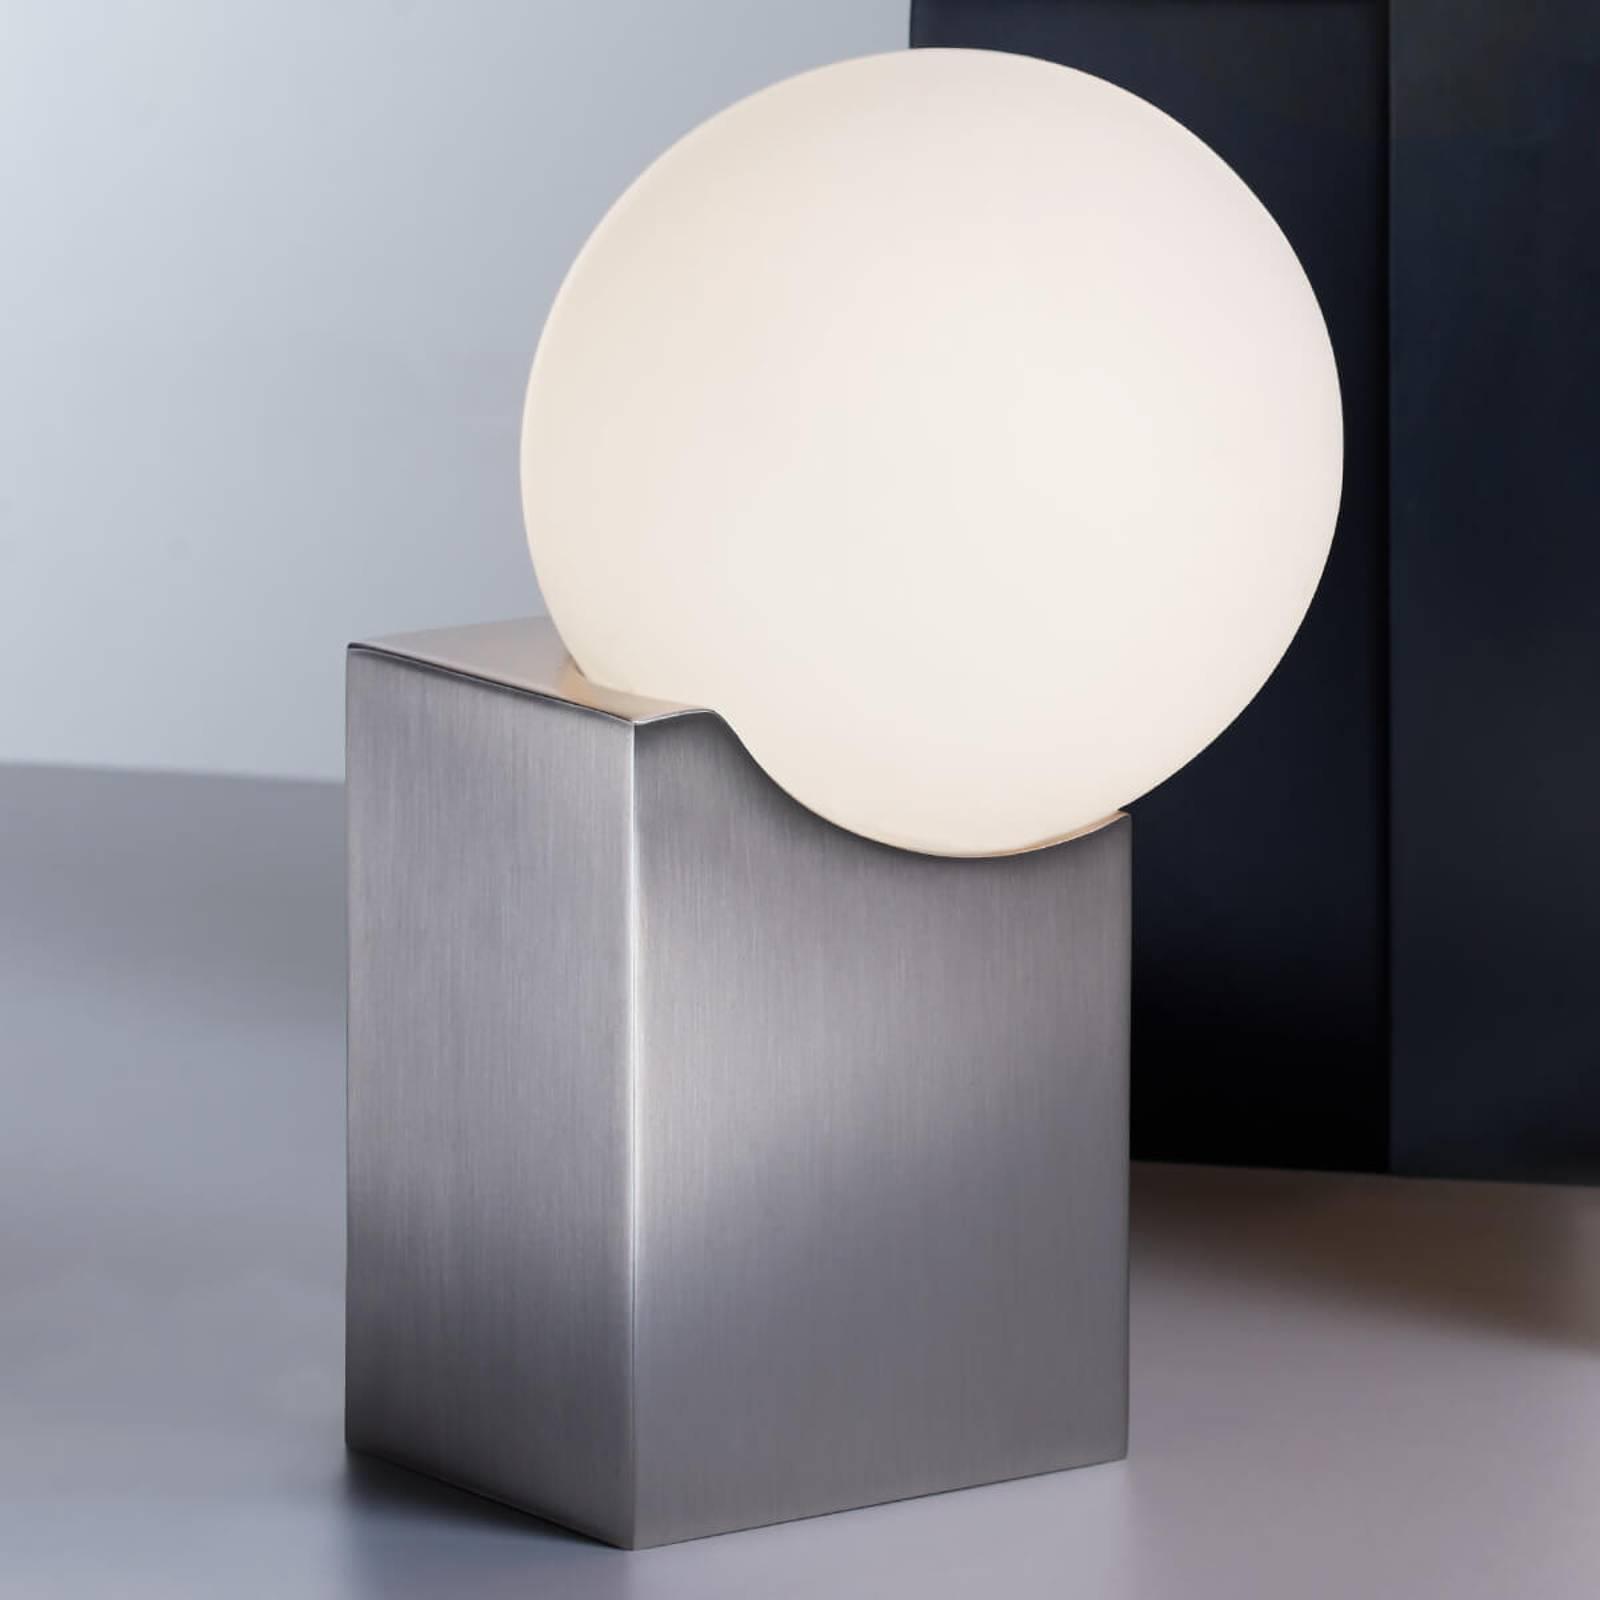 Lampe à poser Cub 17,5cm nickel mat